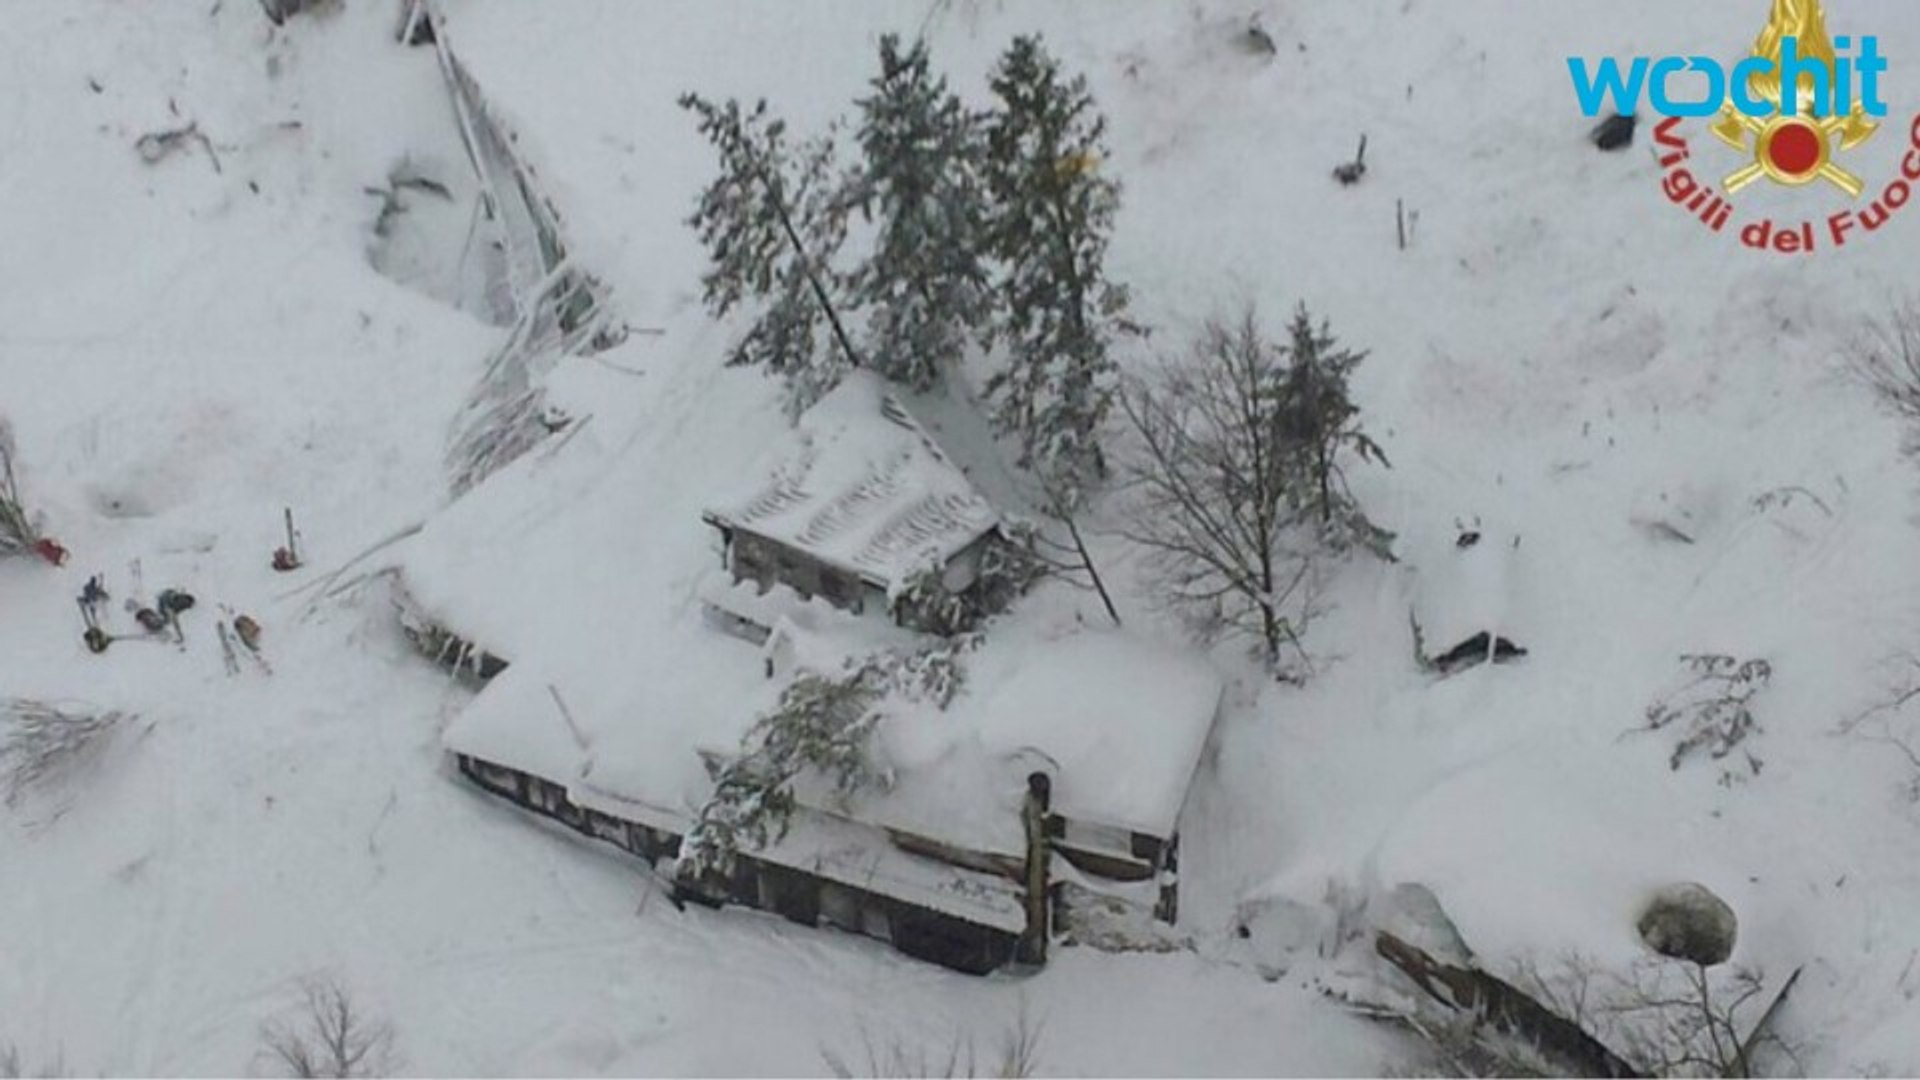 Massive Avalanche Buries Italian 4 Star Hotel